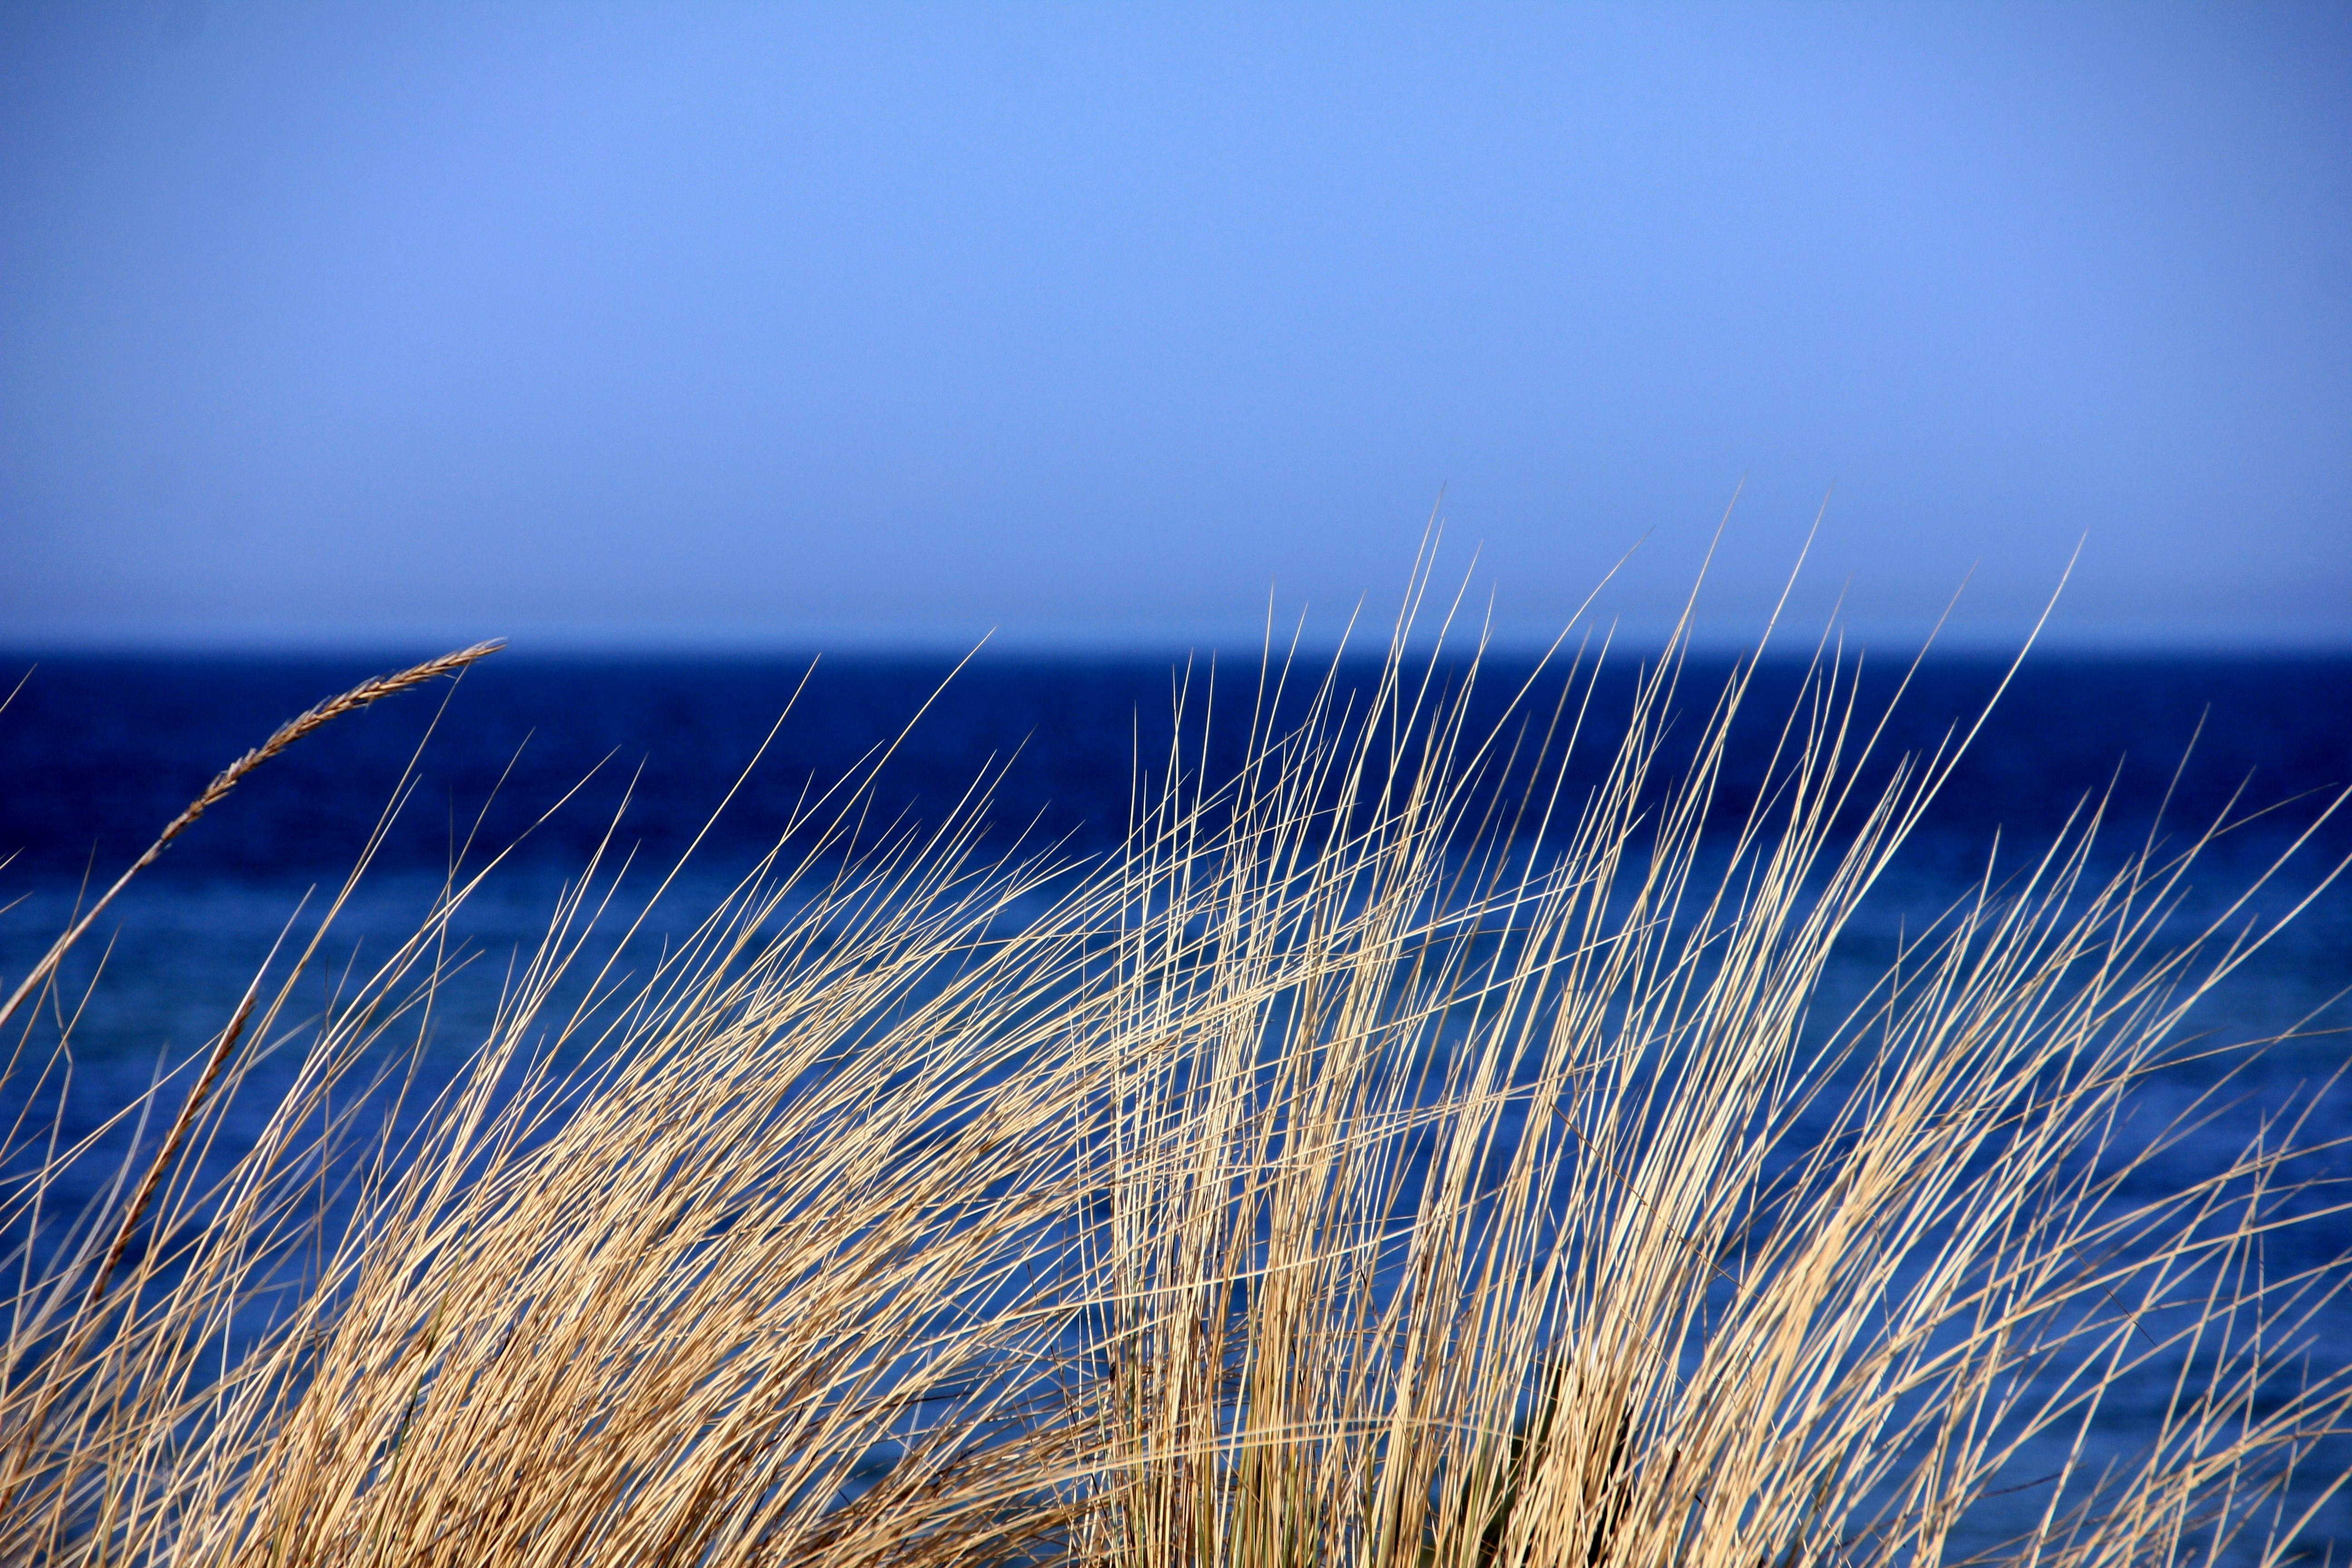 Brown Grass Near Calm Water